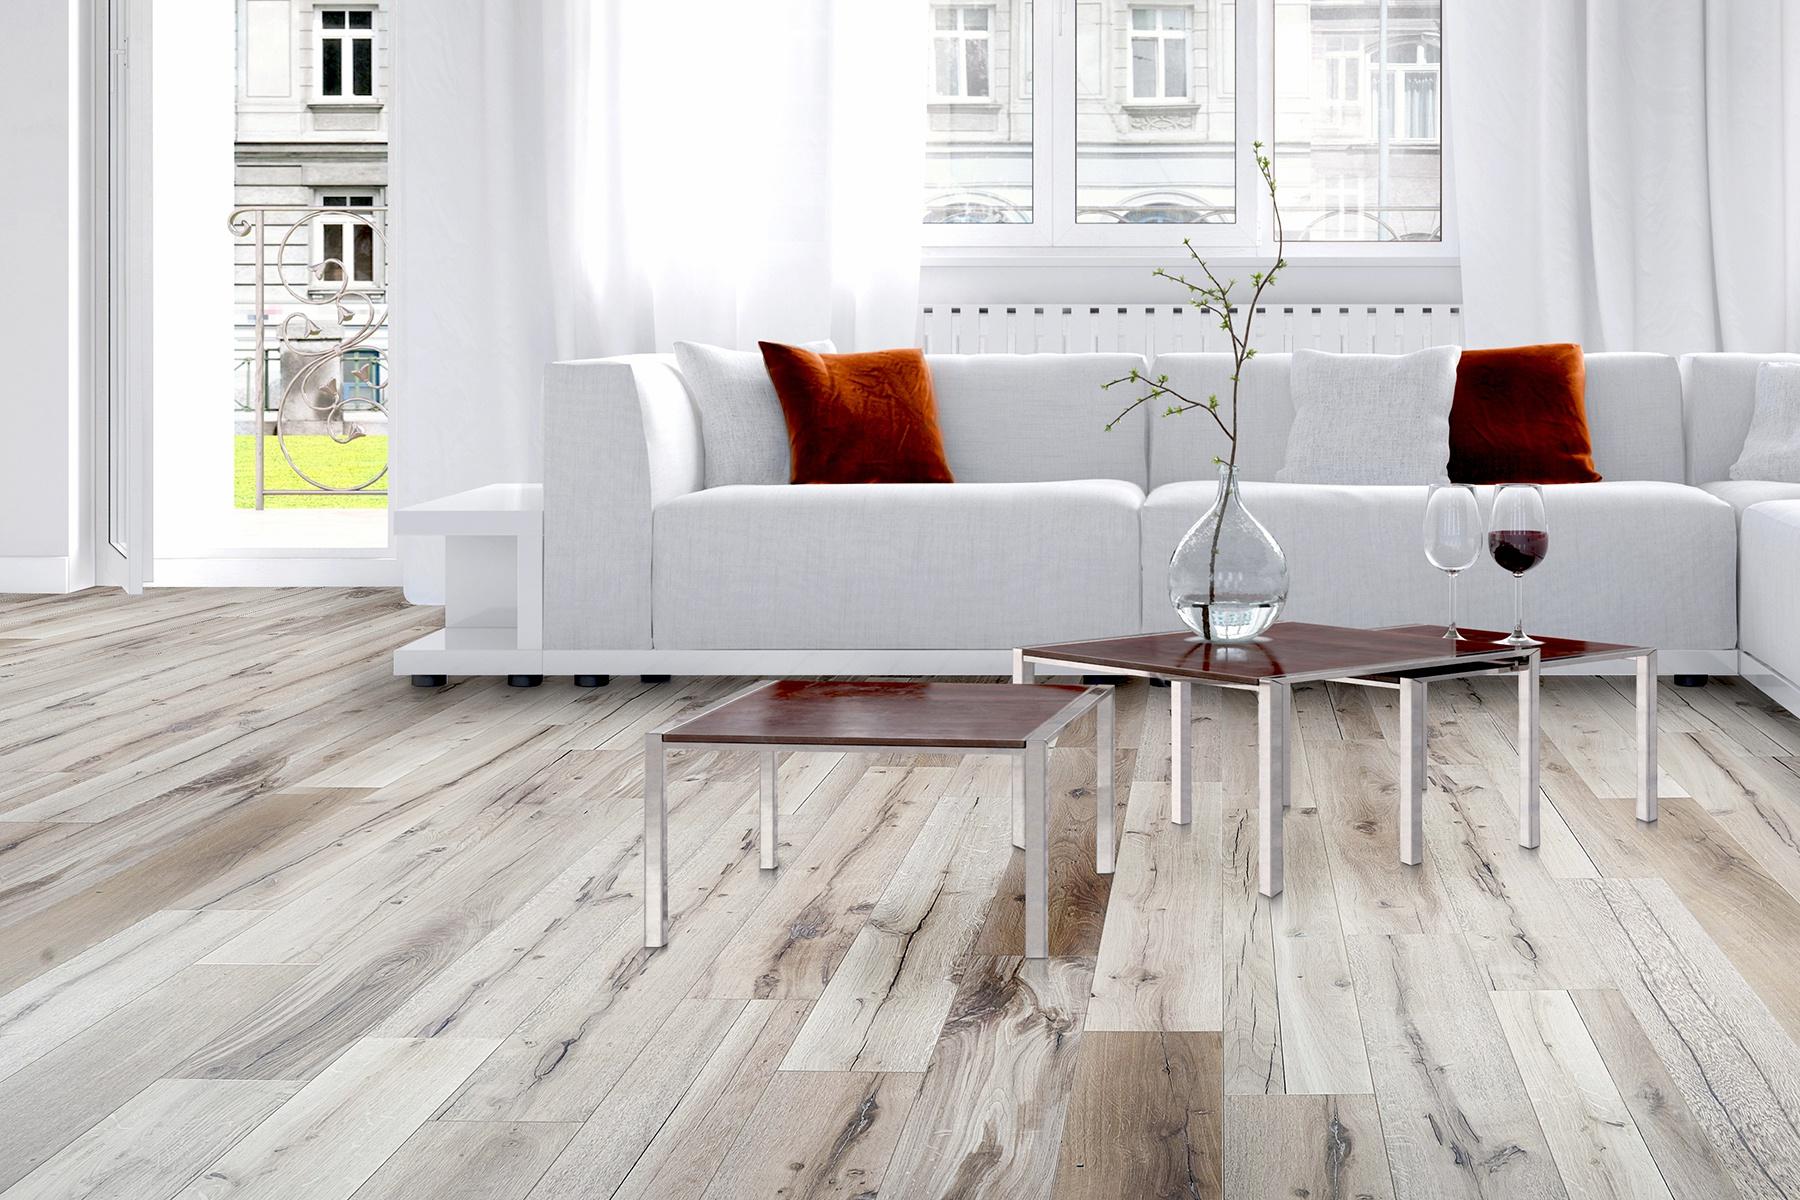 Waterproof Pvc Laminate Flooring